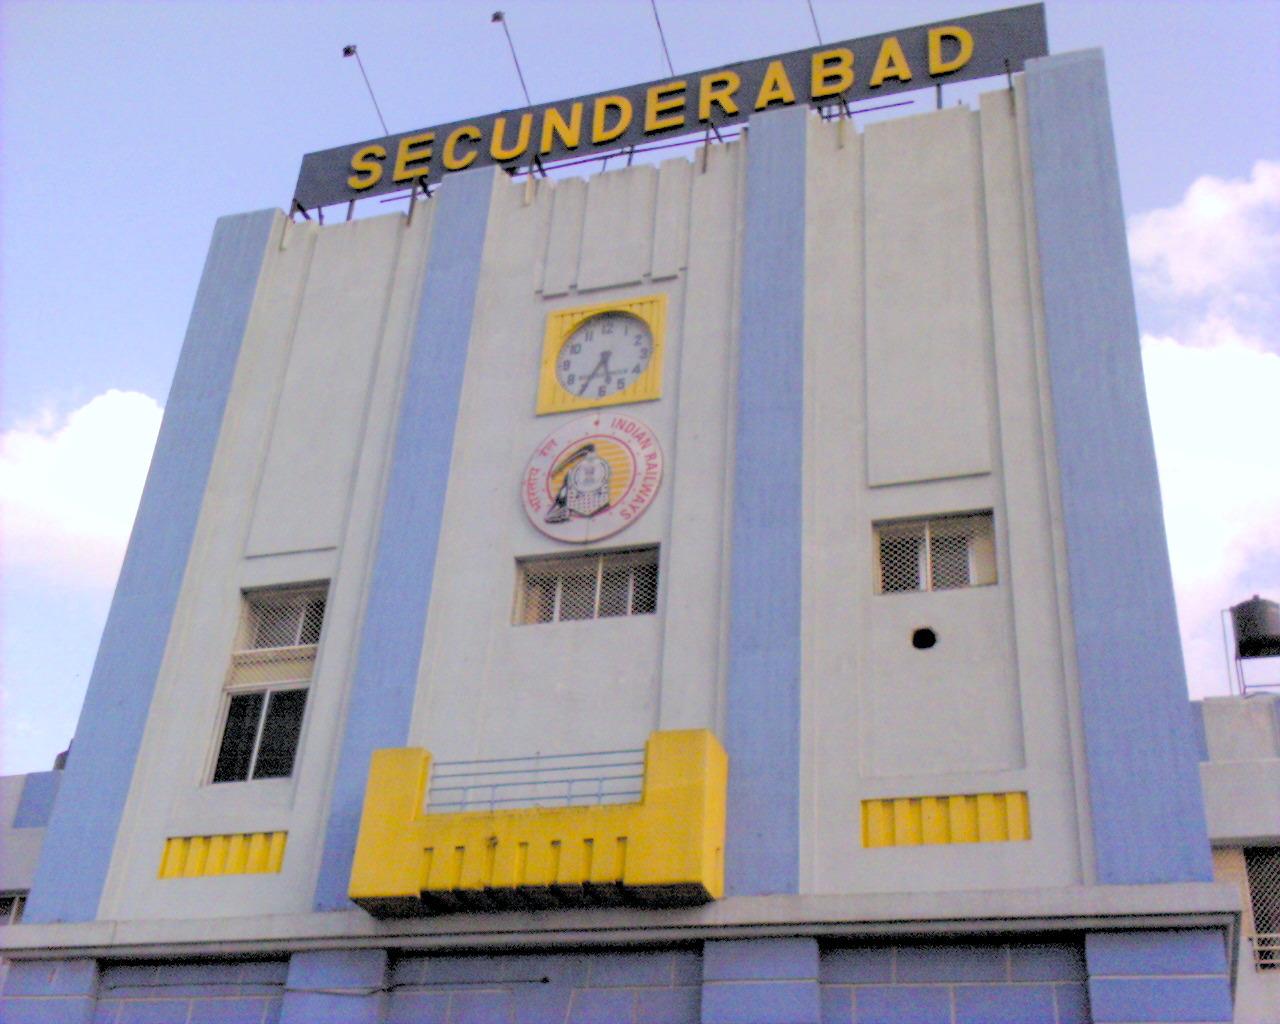 Secunderabad Rly Station 2.jpg